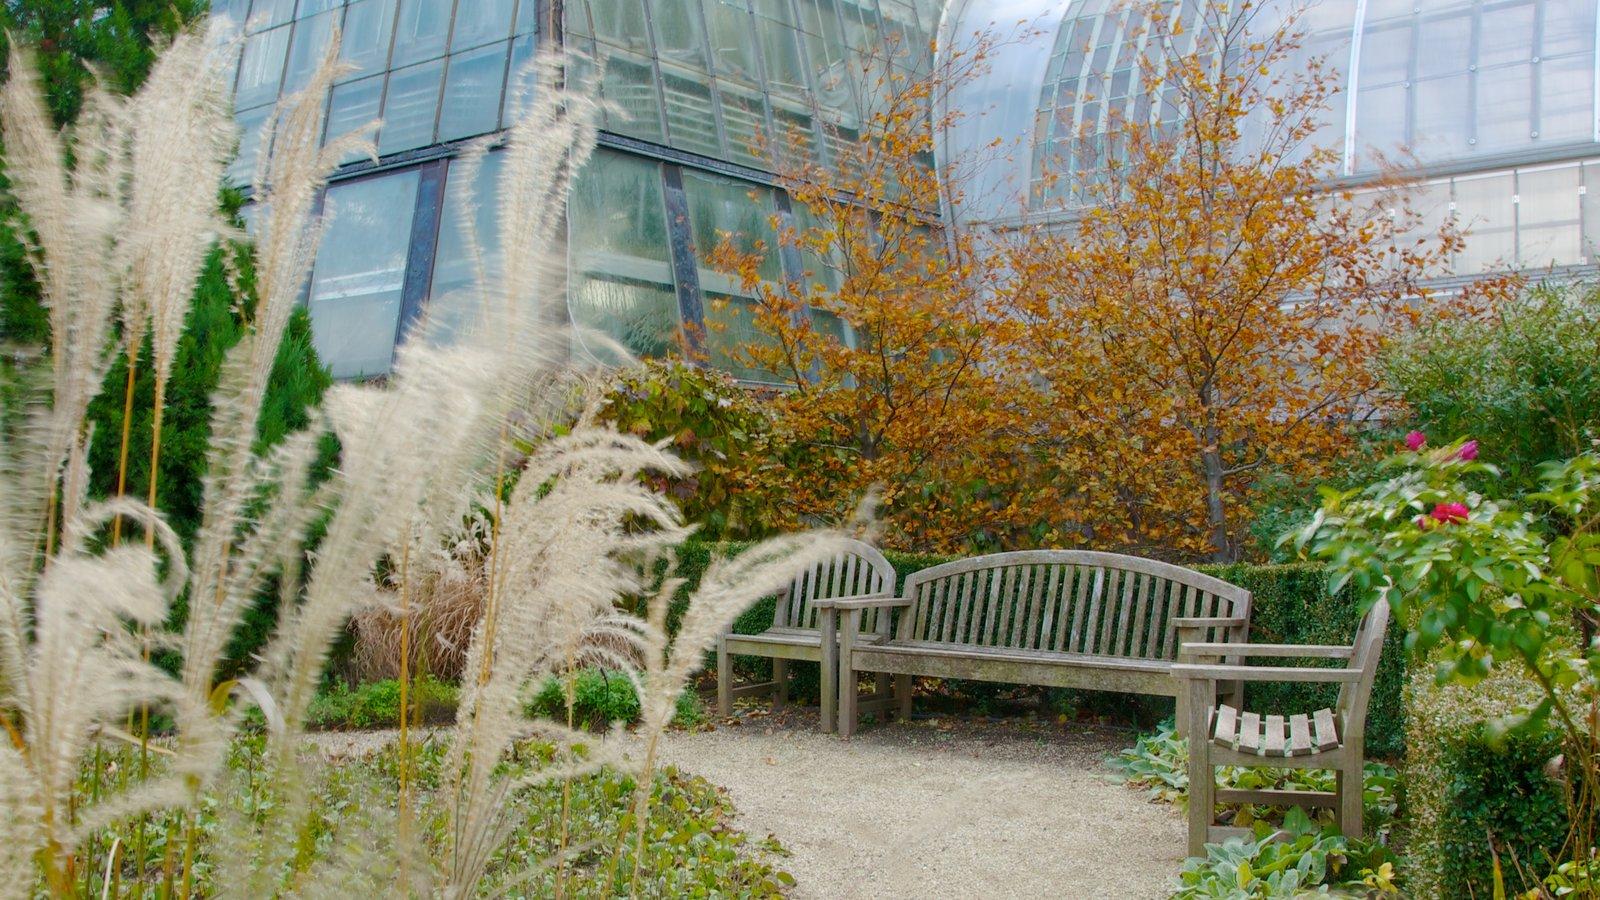 Garfield Park Conservatory featuring a park